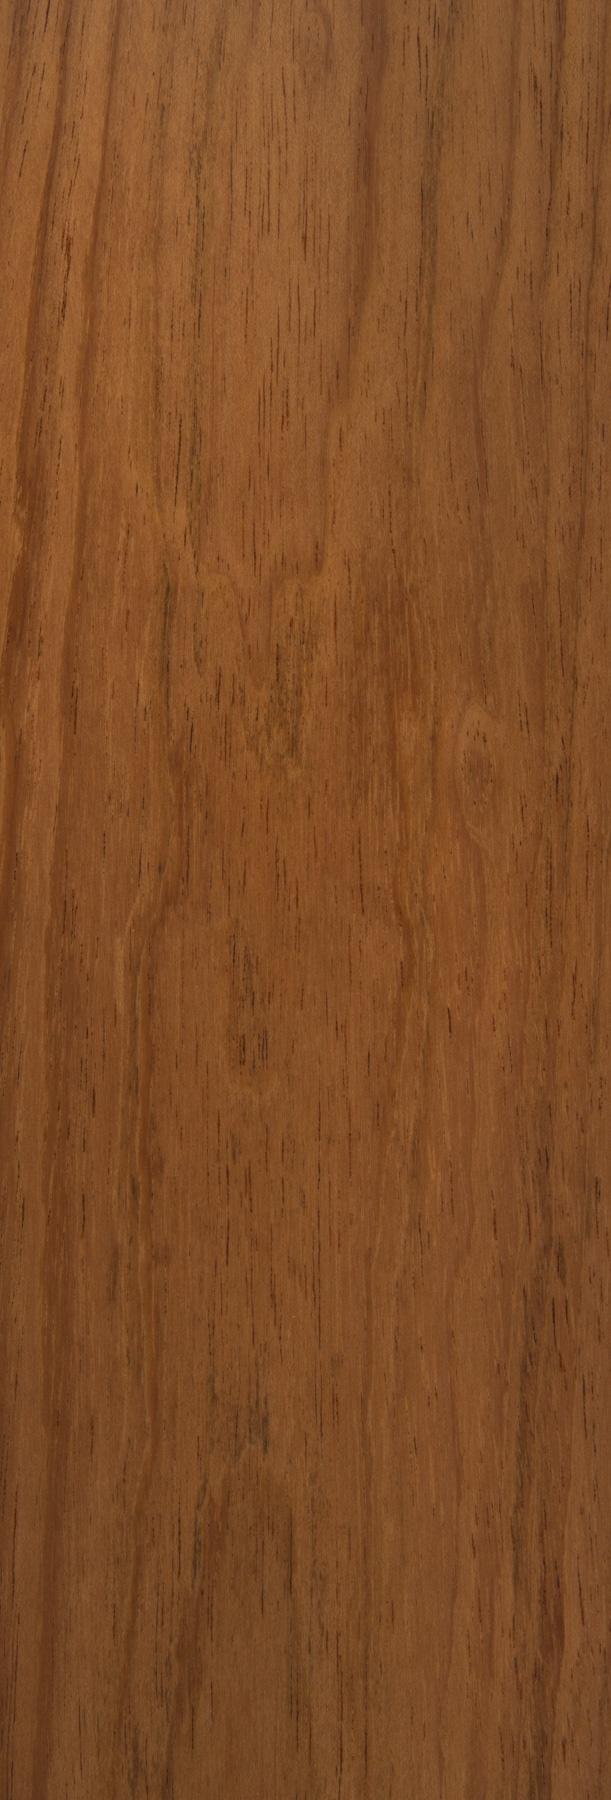 maderas-terramont-vitare-jotoba